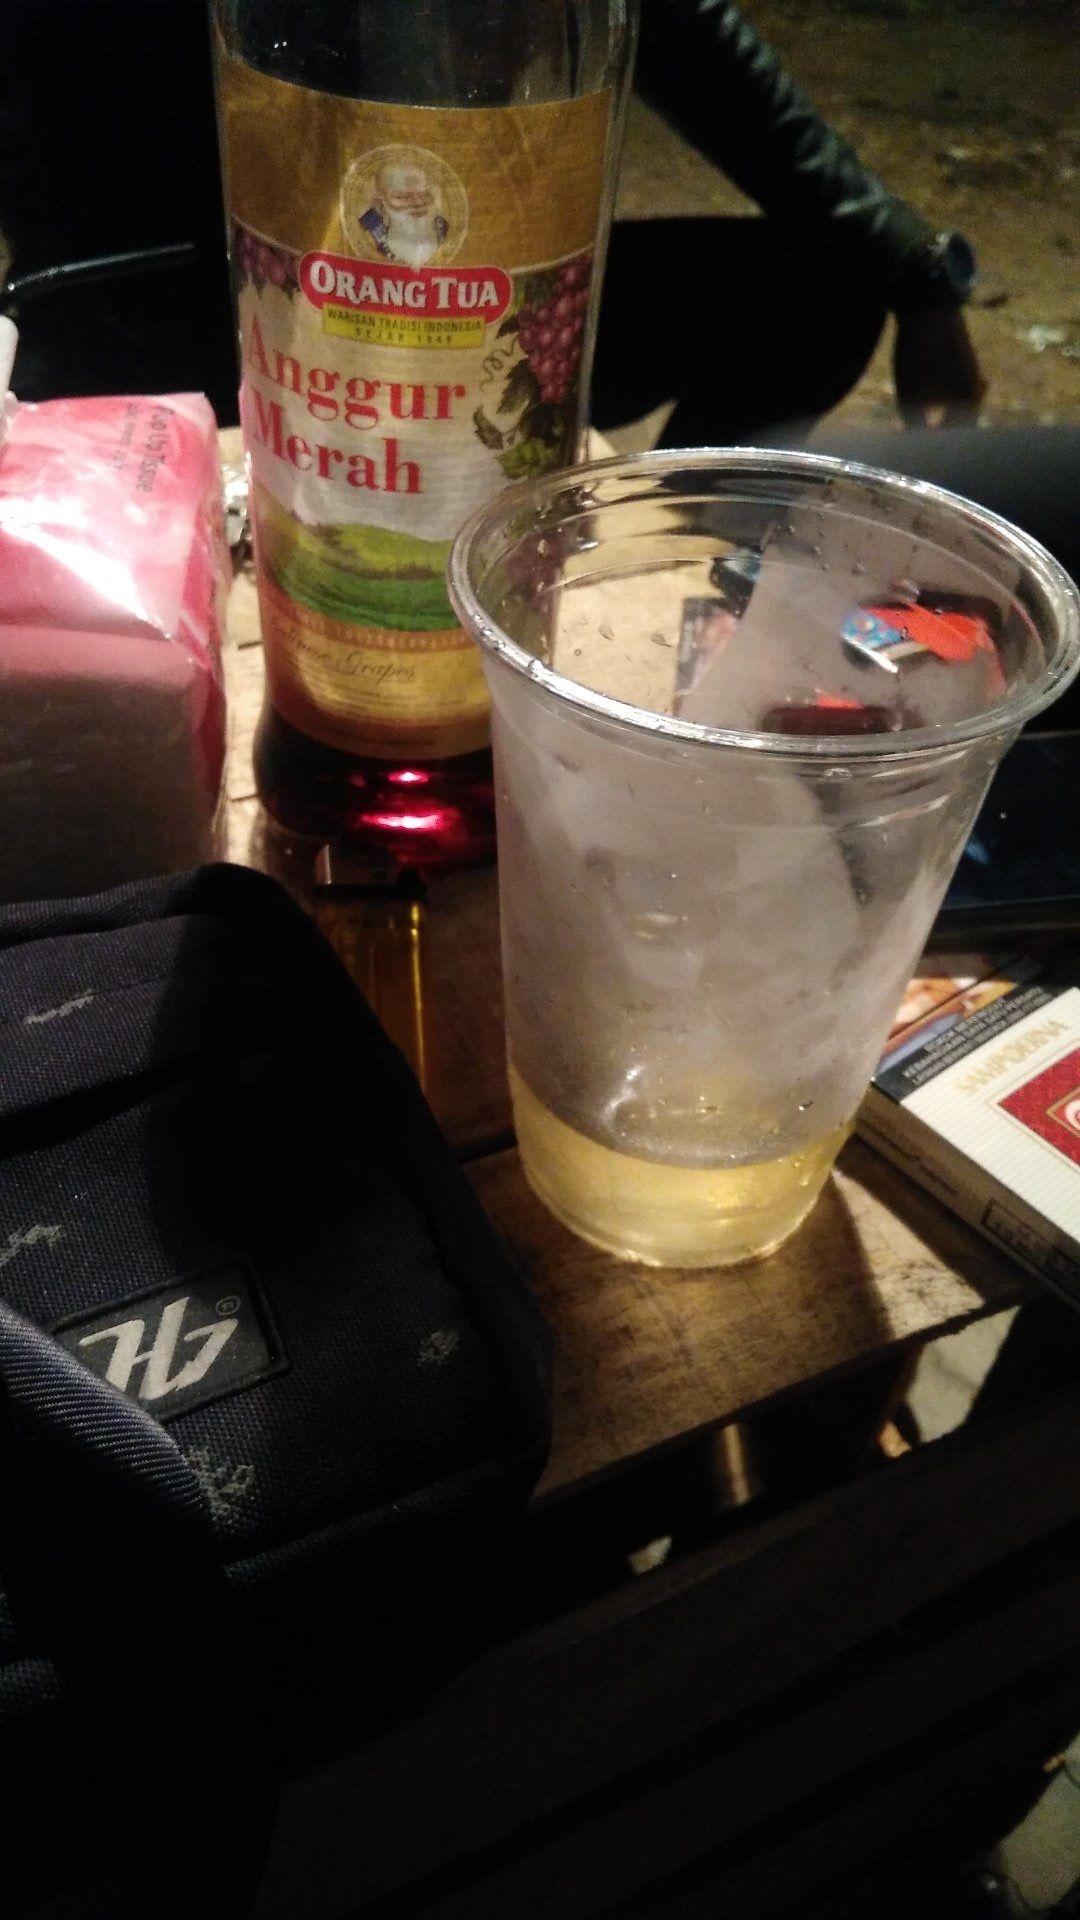 Pin Oleh Trisia Welerubun Di Anggur Merah Minuman Keras Alkohol